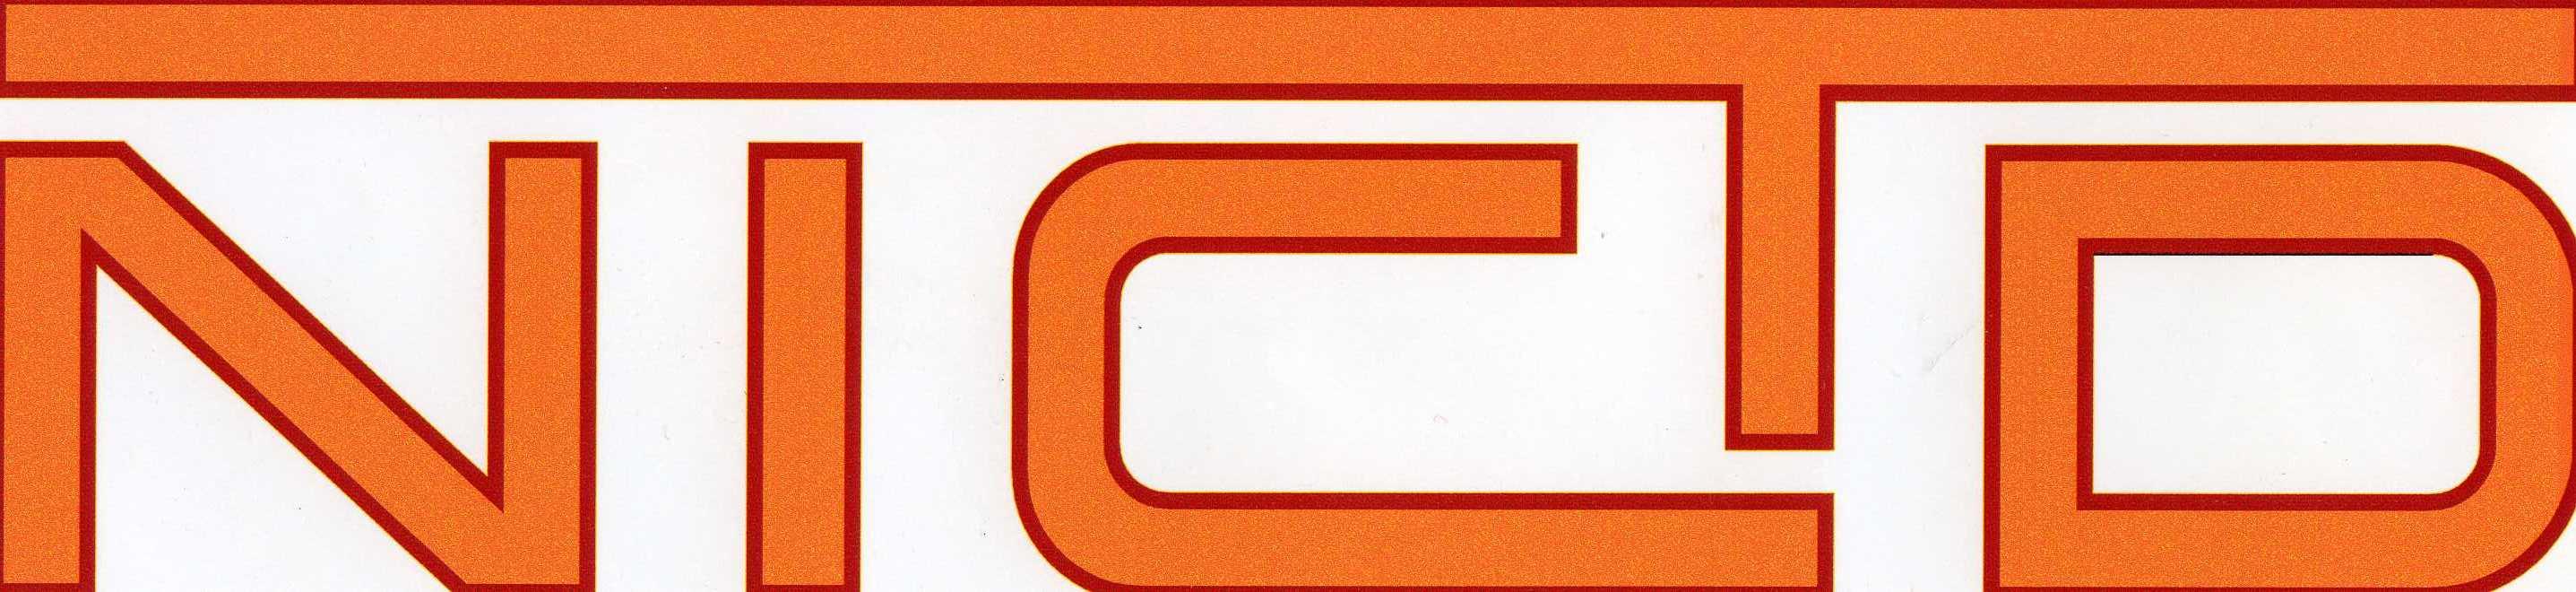 NICTD-logo